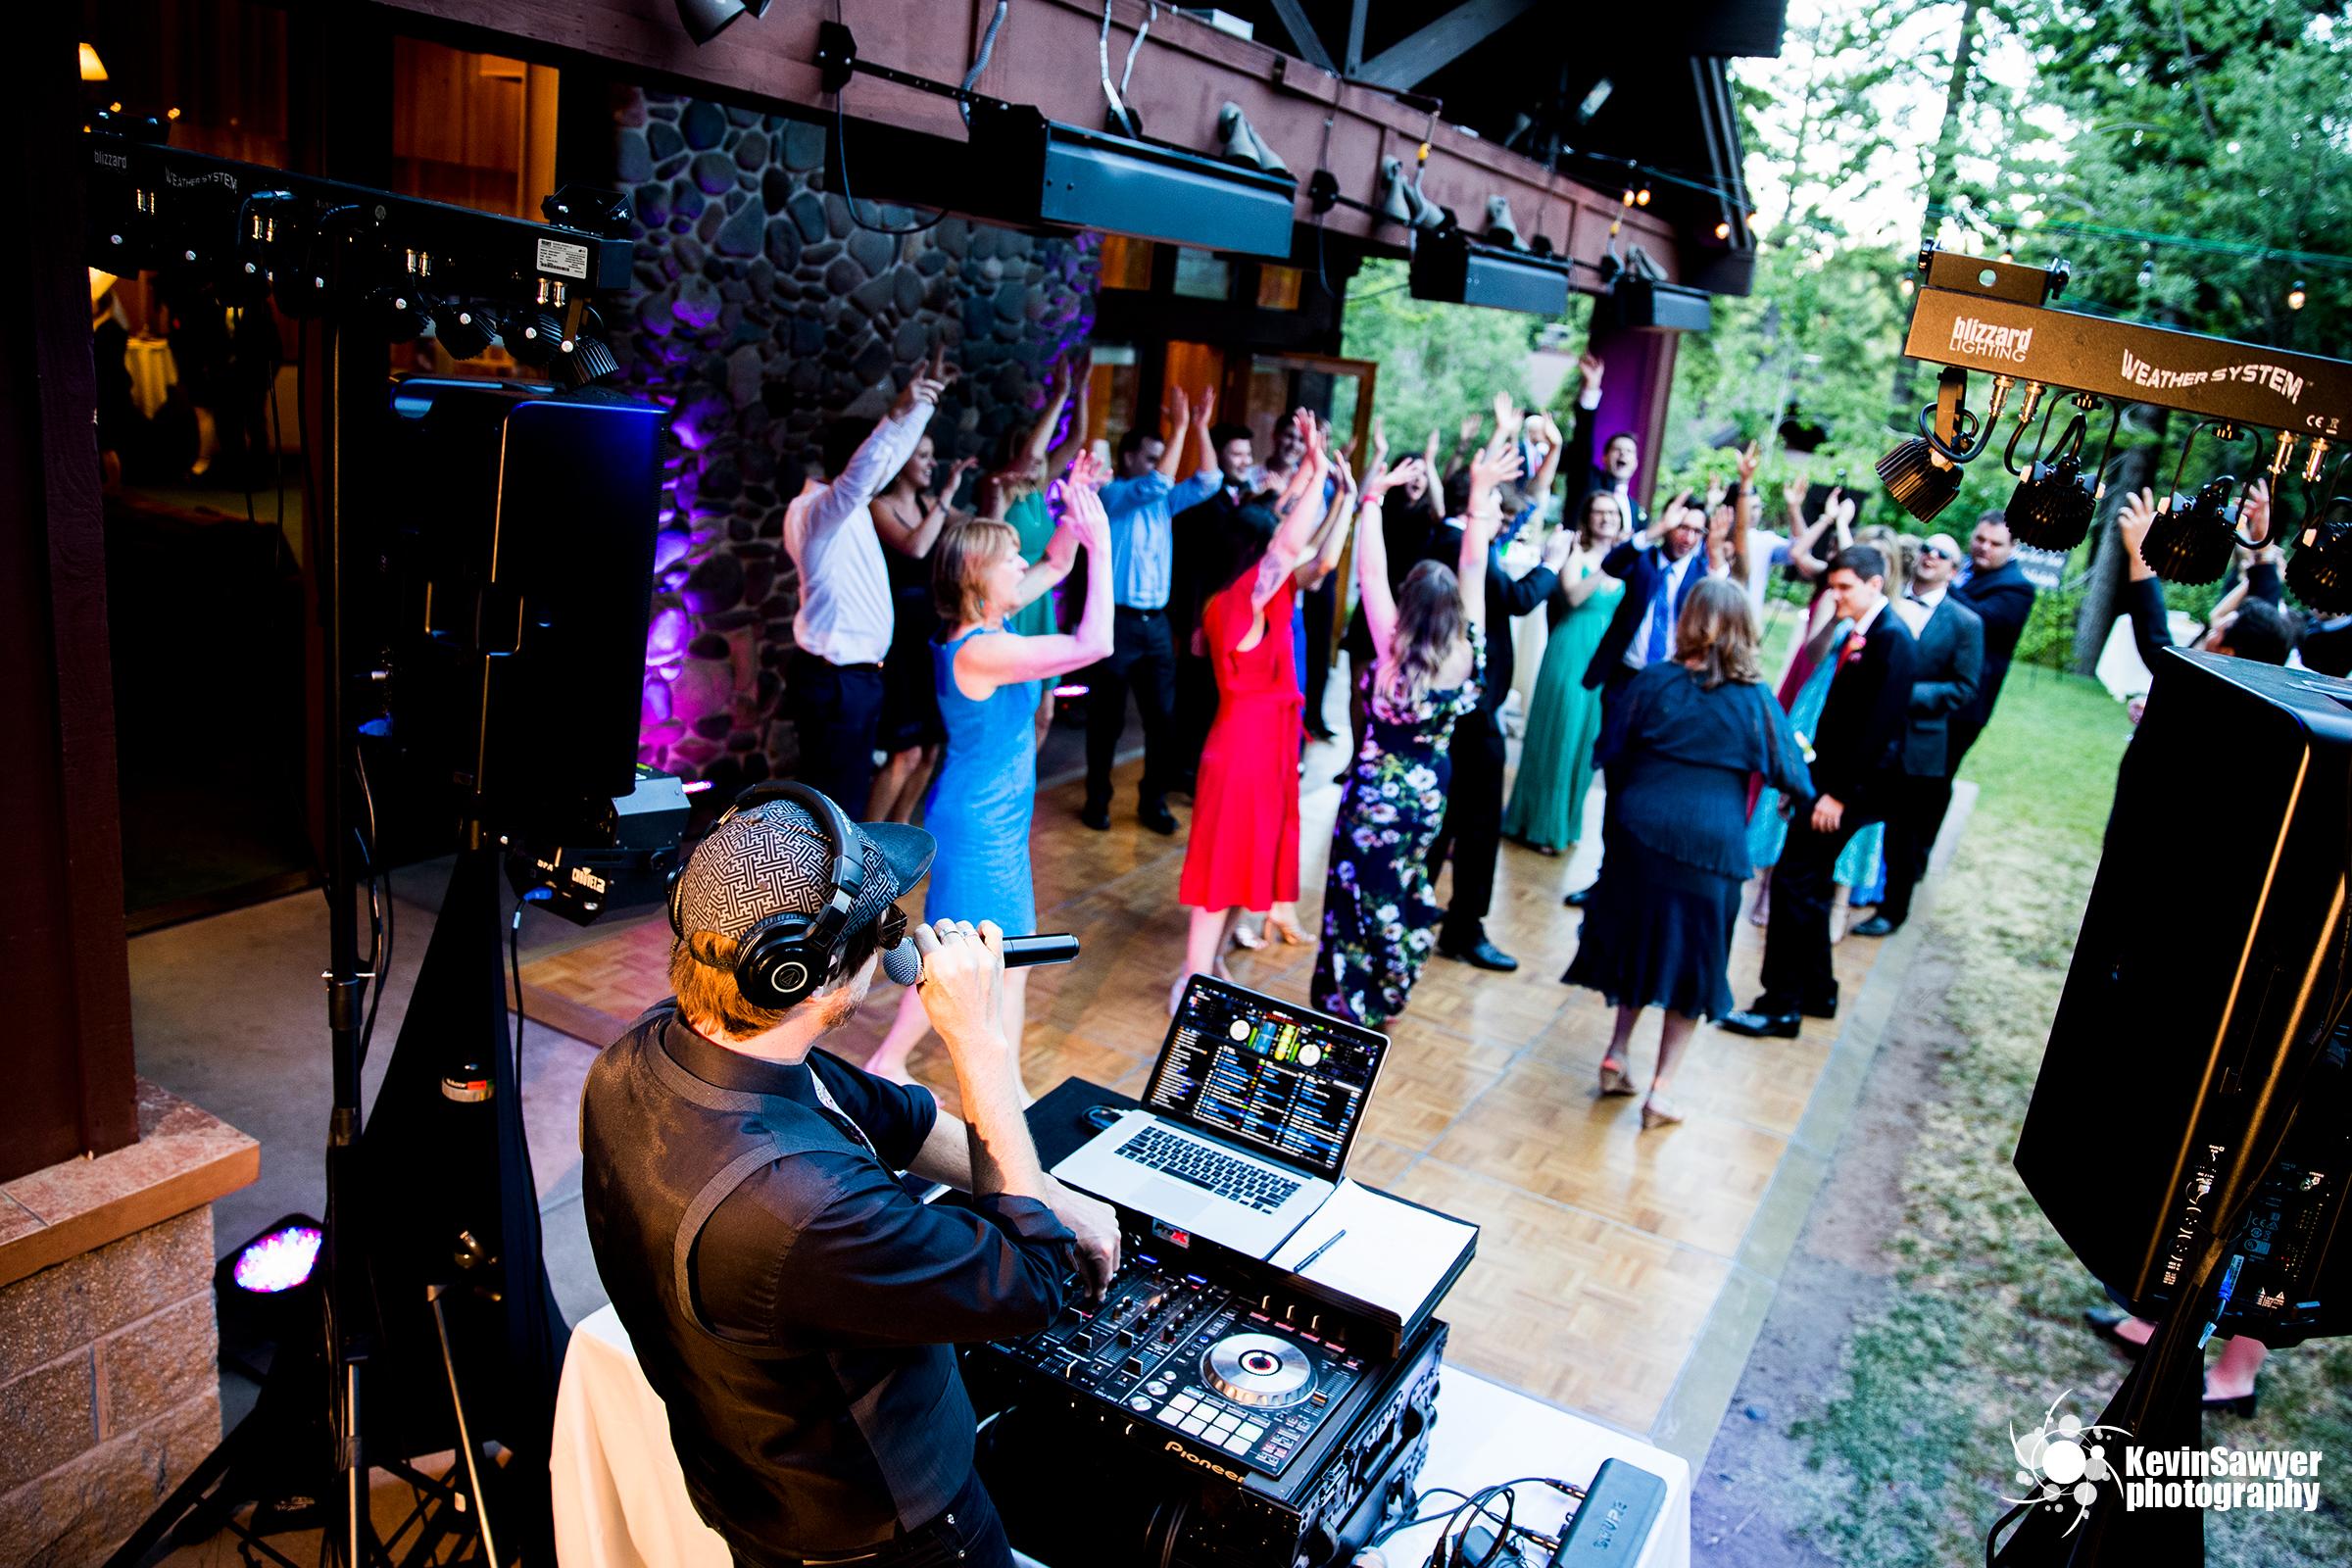 kevin_sawyer_lake_tahoe_wedding_photographer_dj_zeb.jpg